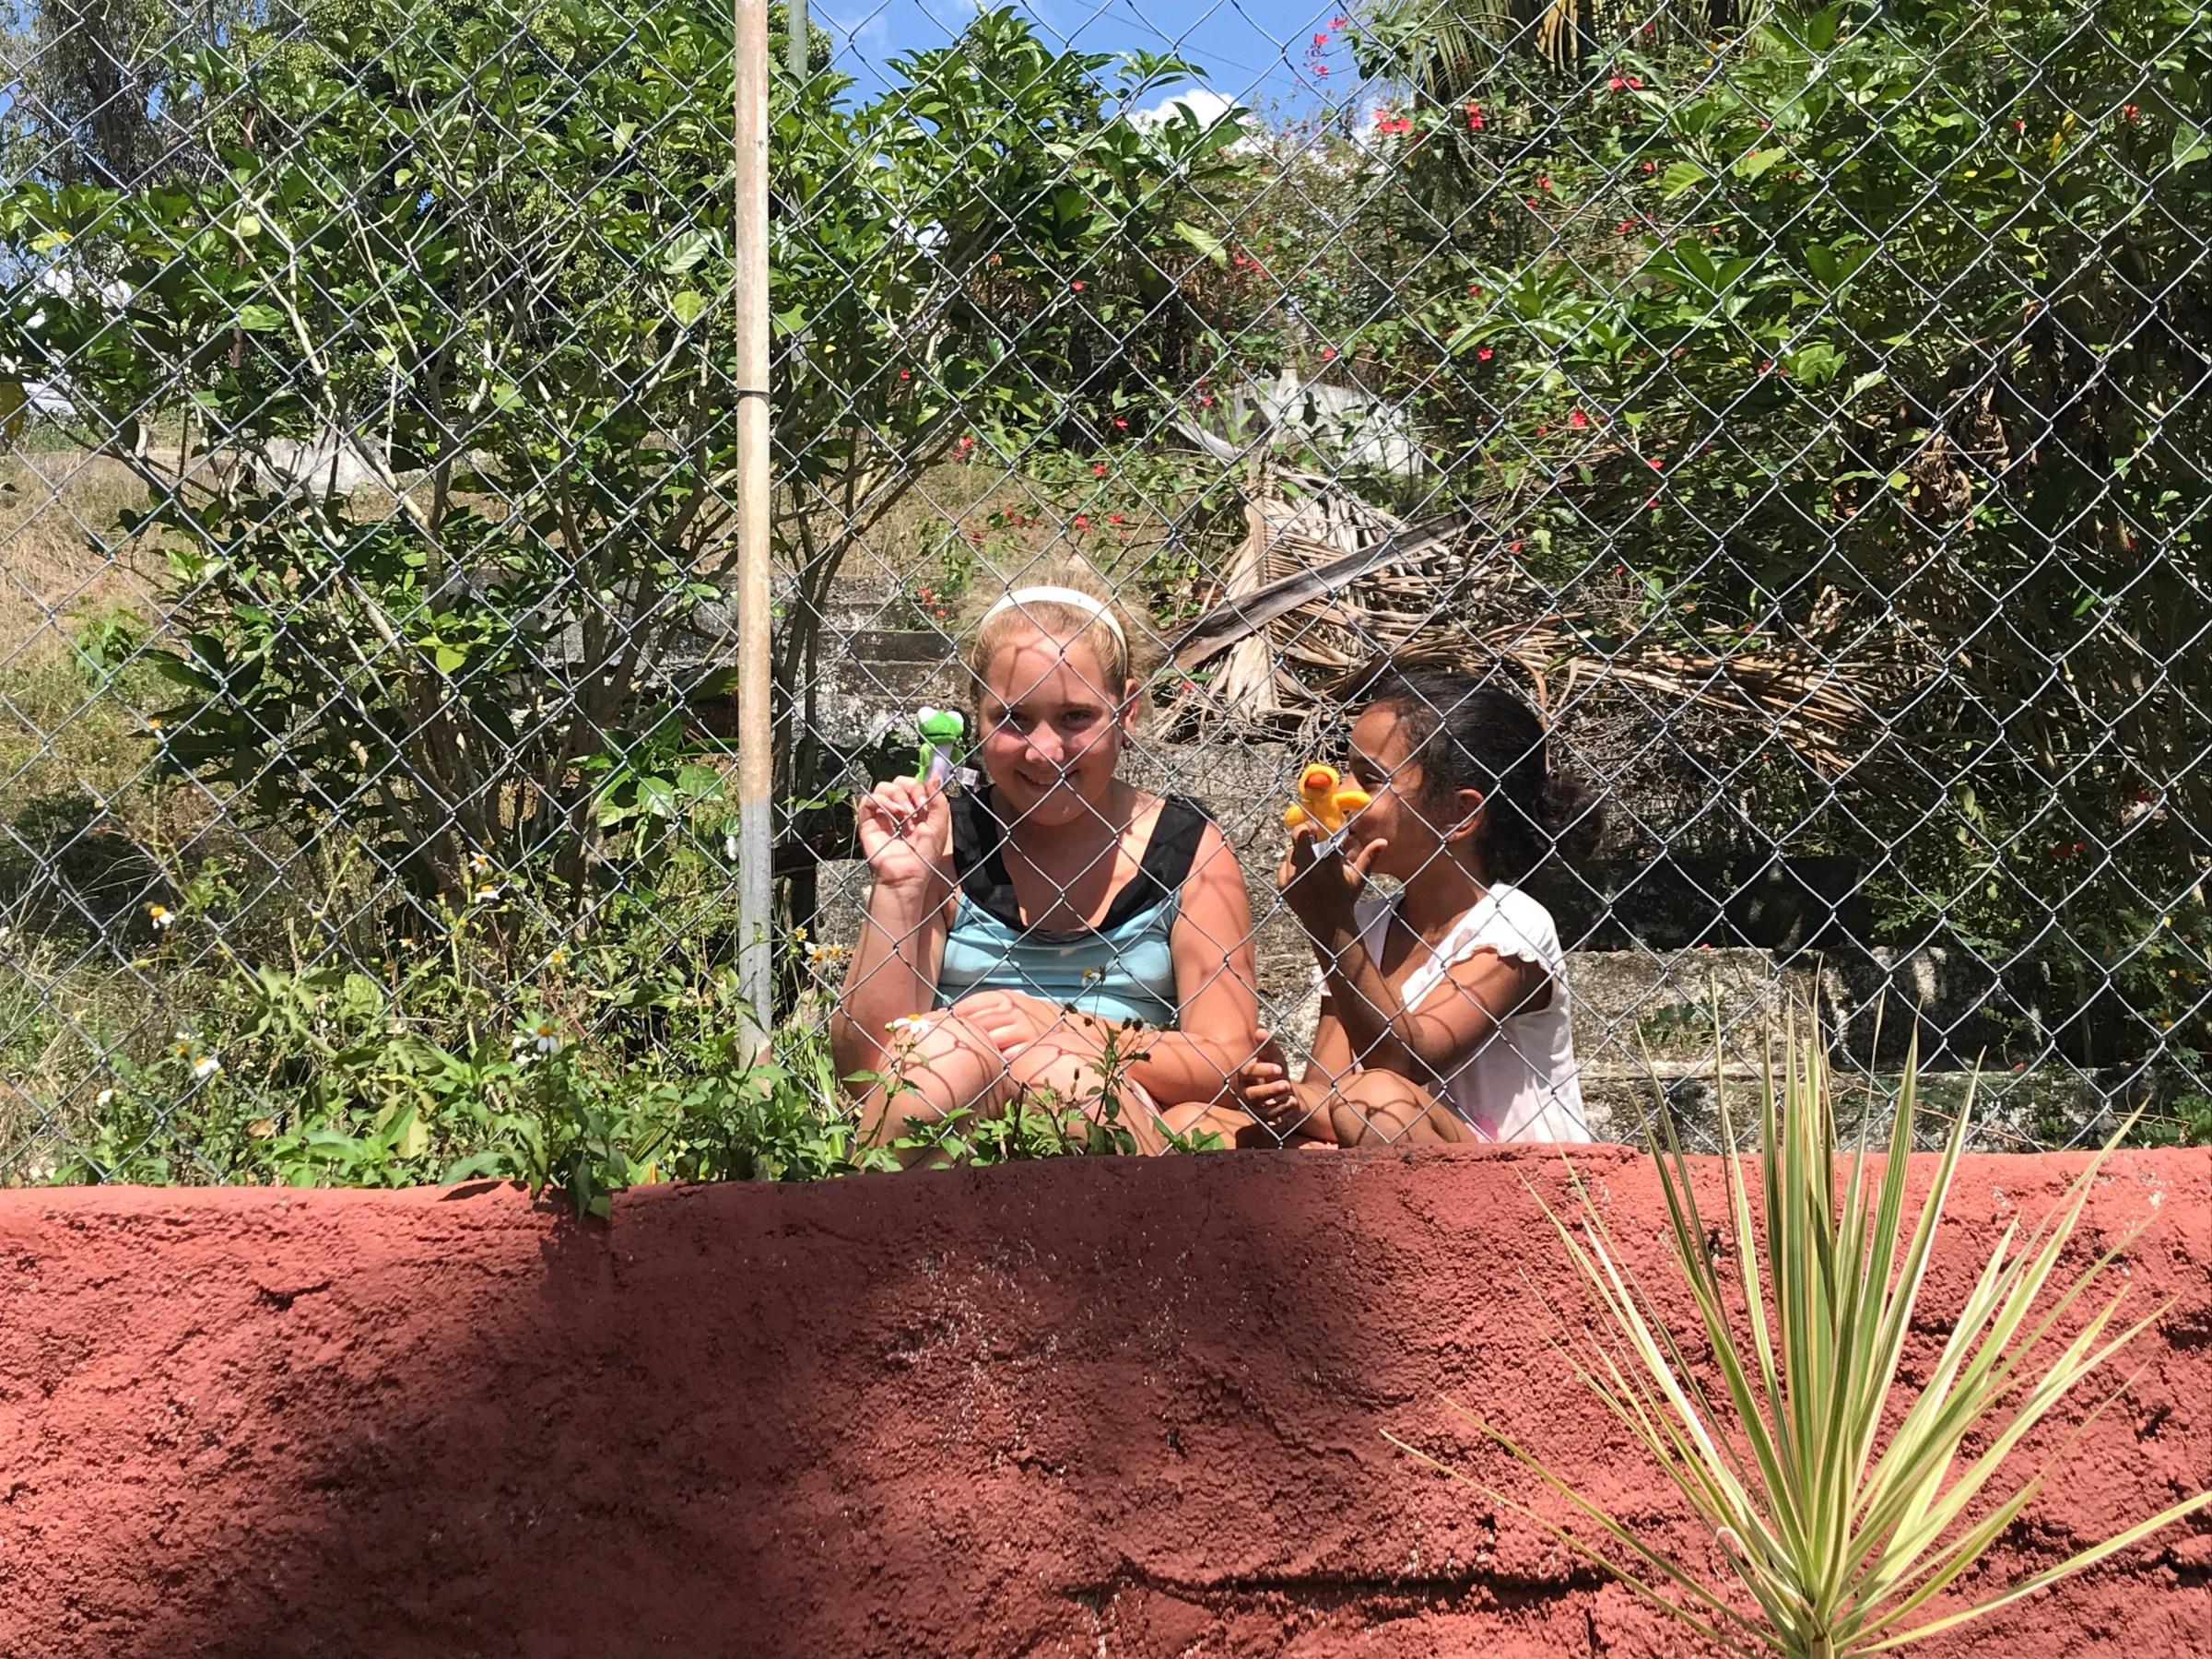 flickor som leker med fingerdockor